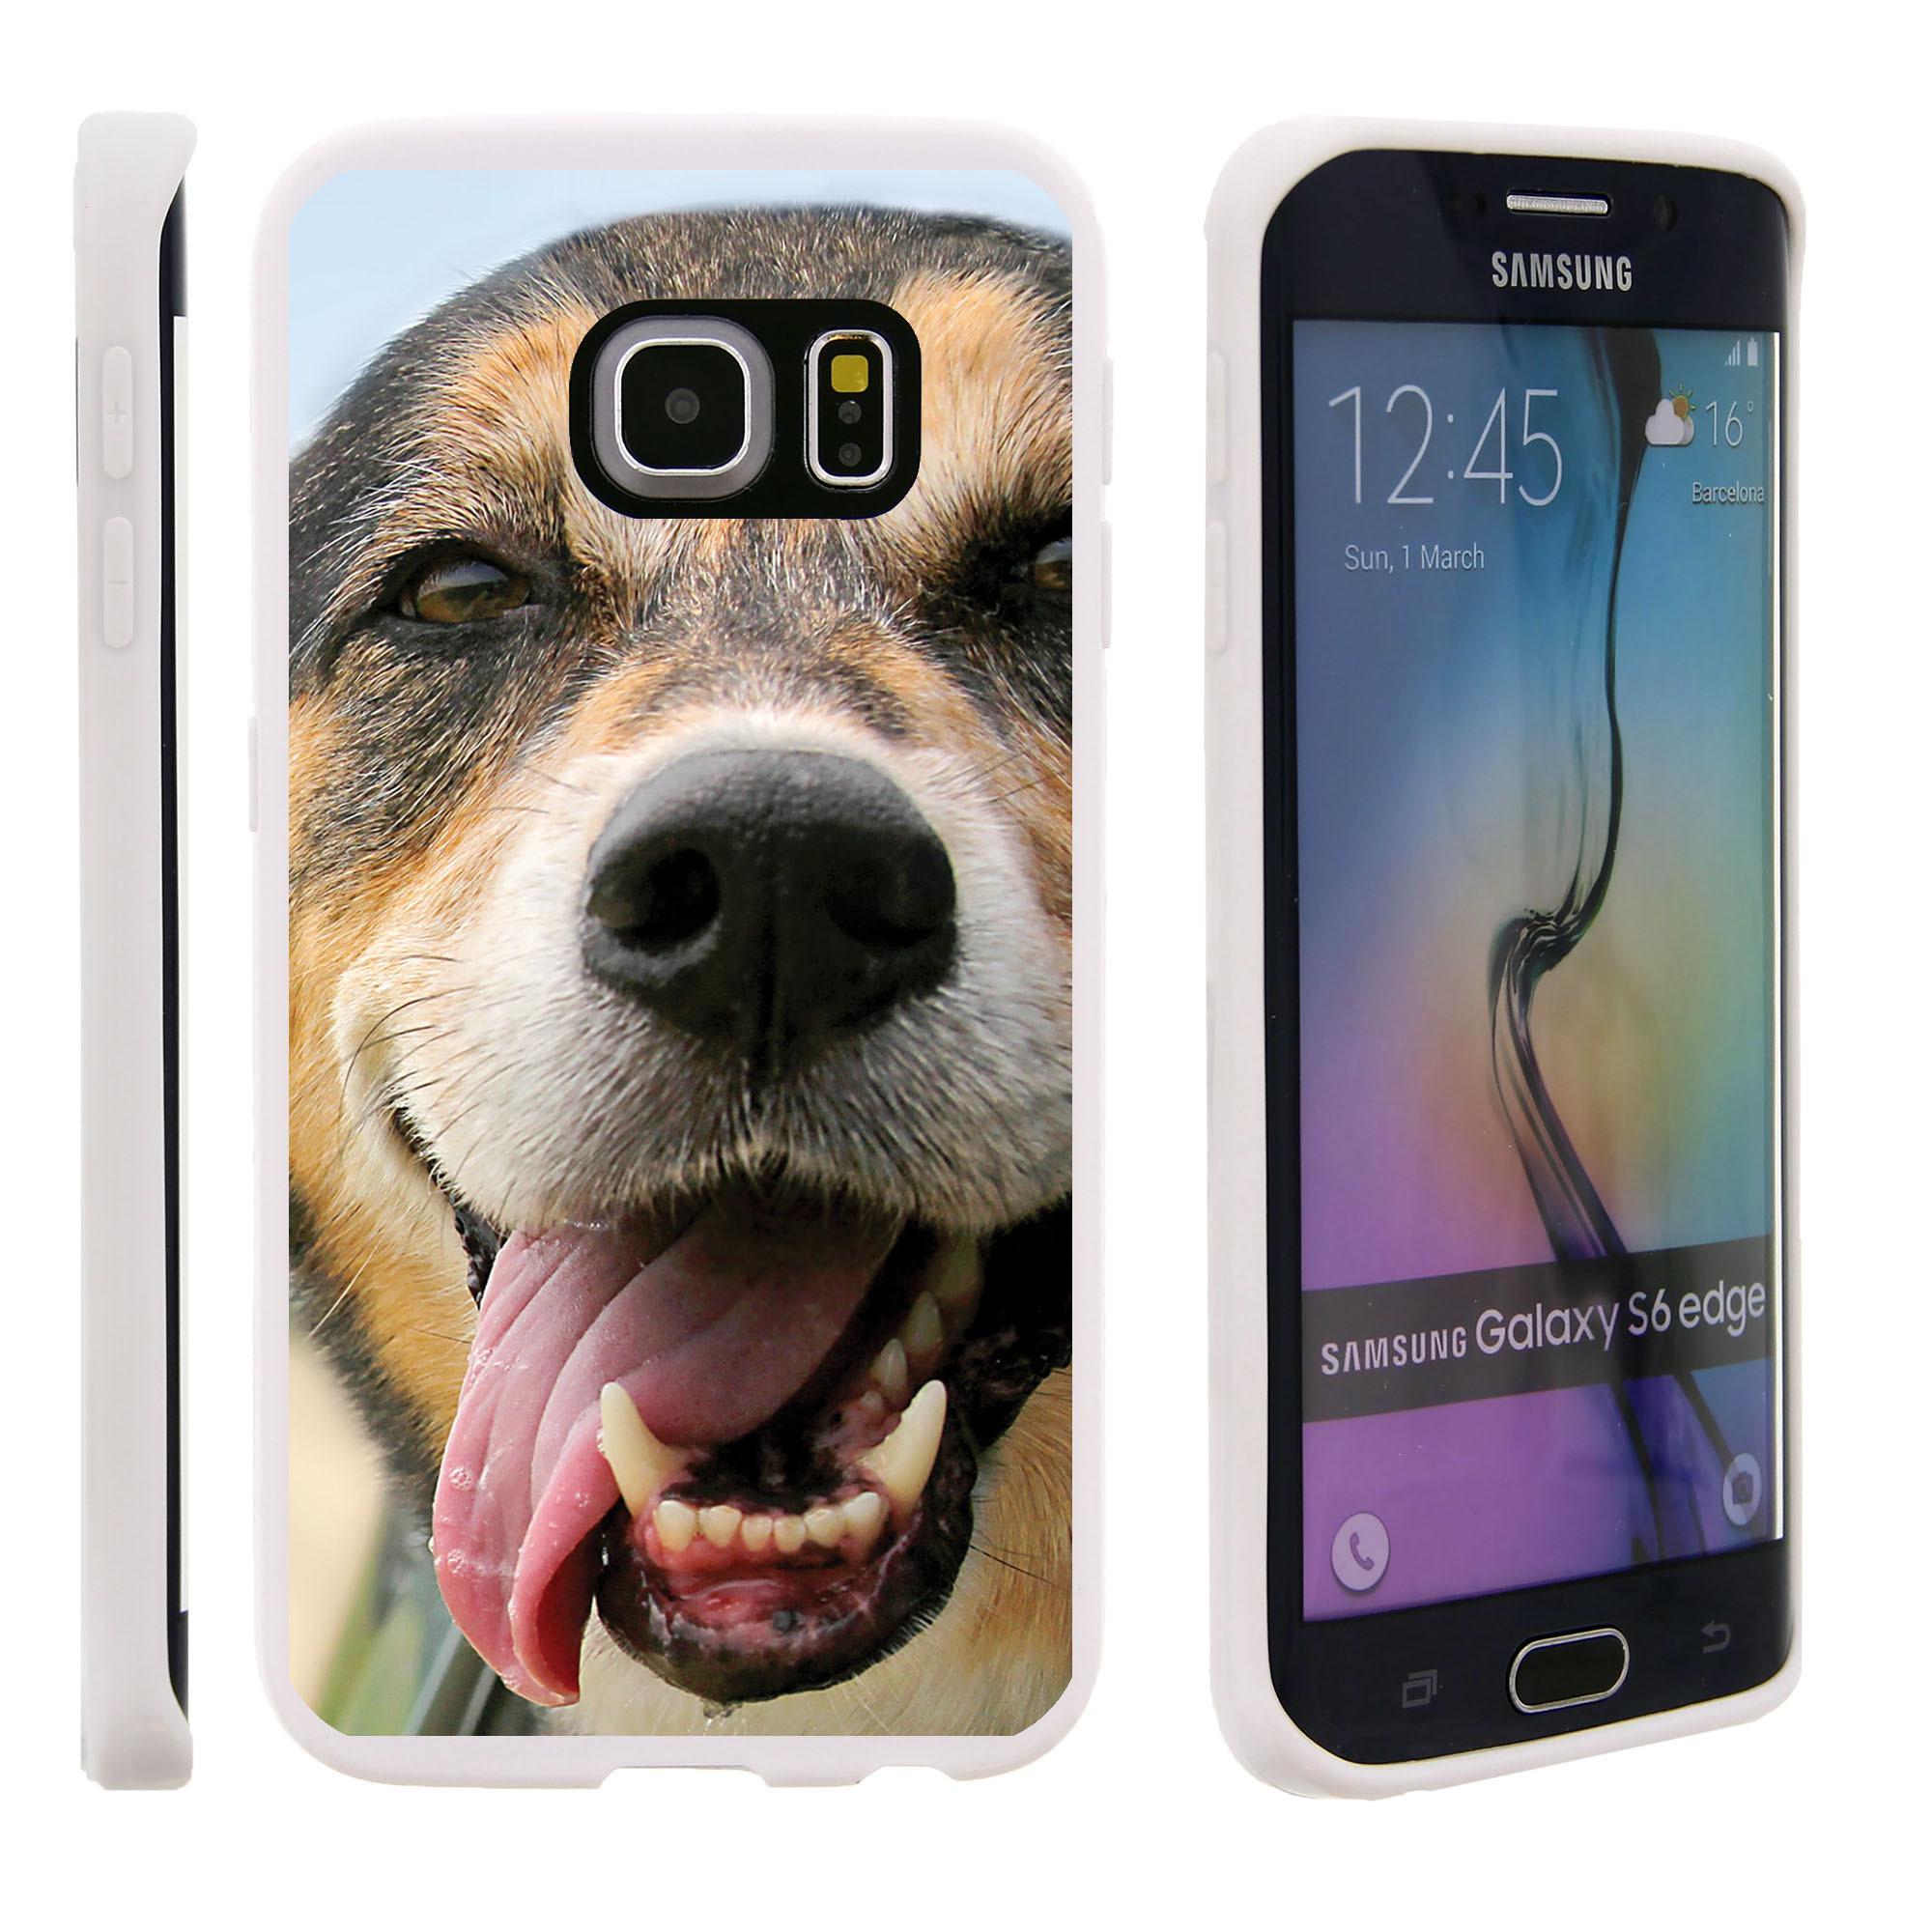 Samsung Galaxy S6 Edge G925, Flexible Case [FLEX FORCE] Slim Durable TPU Sleek Bumper with Unique Designs - Tongue Out Dog